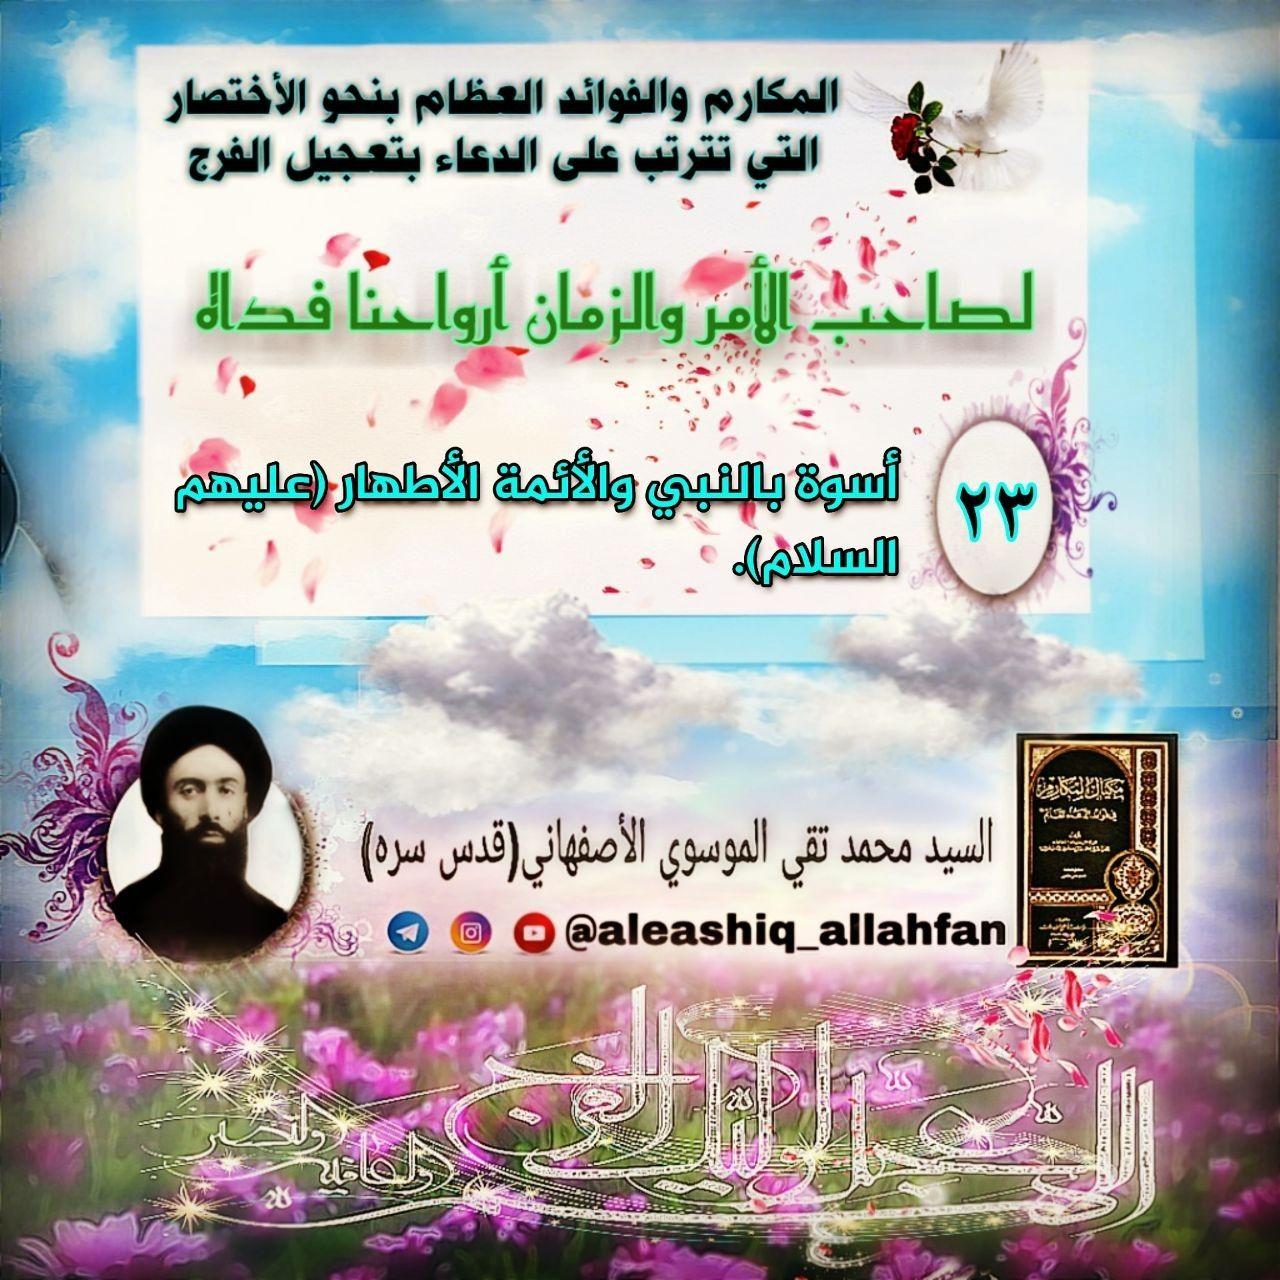 Pin By السيد محمد تقي الاصفهاني Aleas On اللهم عجل لوليك الفرج In 2021 Book Cover Books Poster